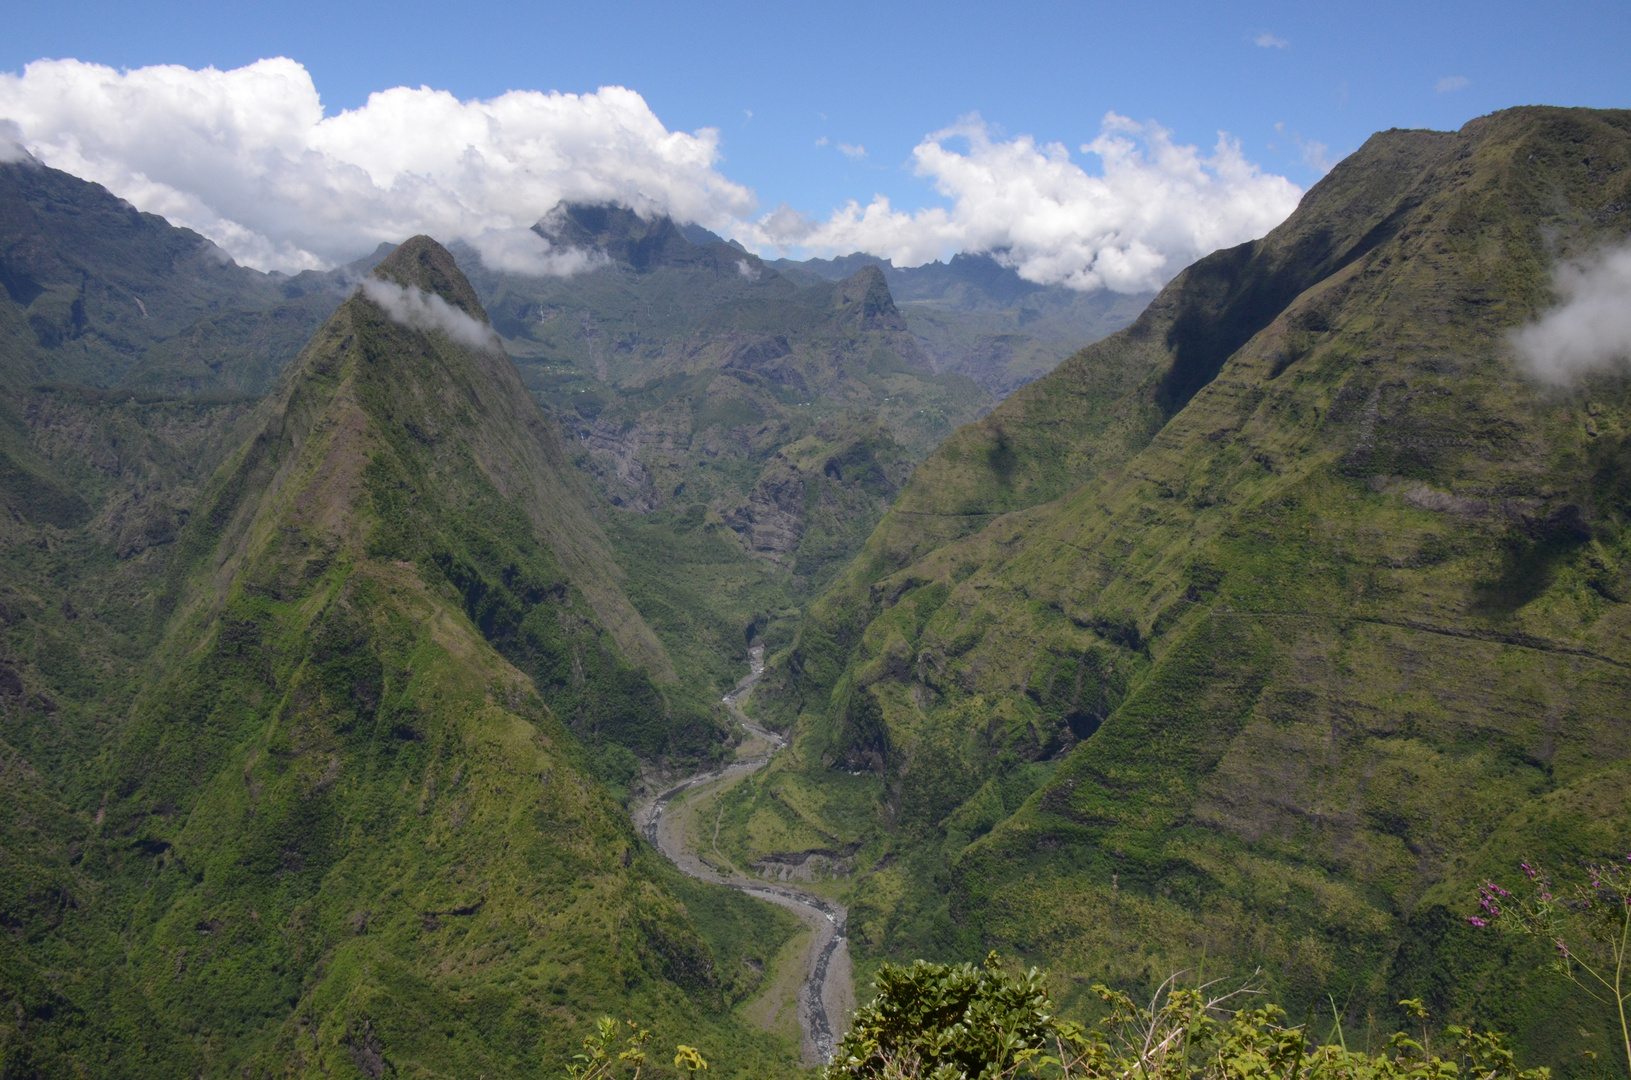 La Réunion : Blick vom Cap Noir in den Cirque Mafate